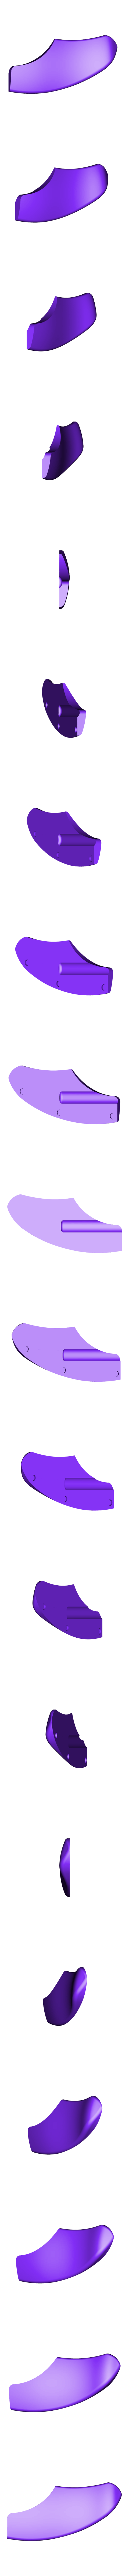 plaquette_arrière.stl Download free STL file Folding Astroller knife with locking catch • 3D printer design, NOP21